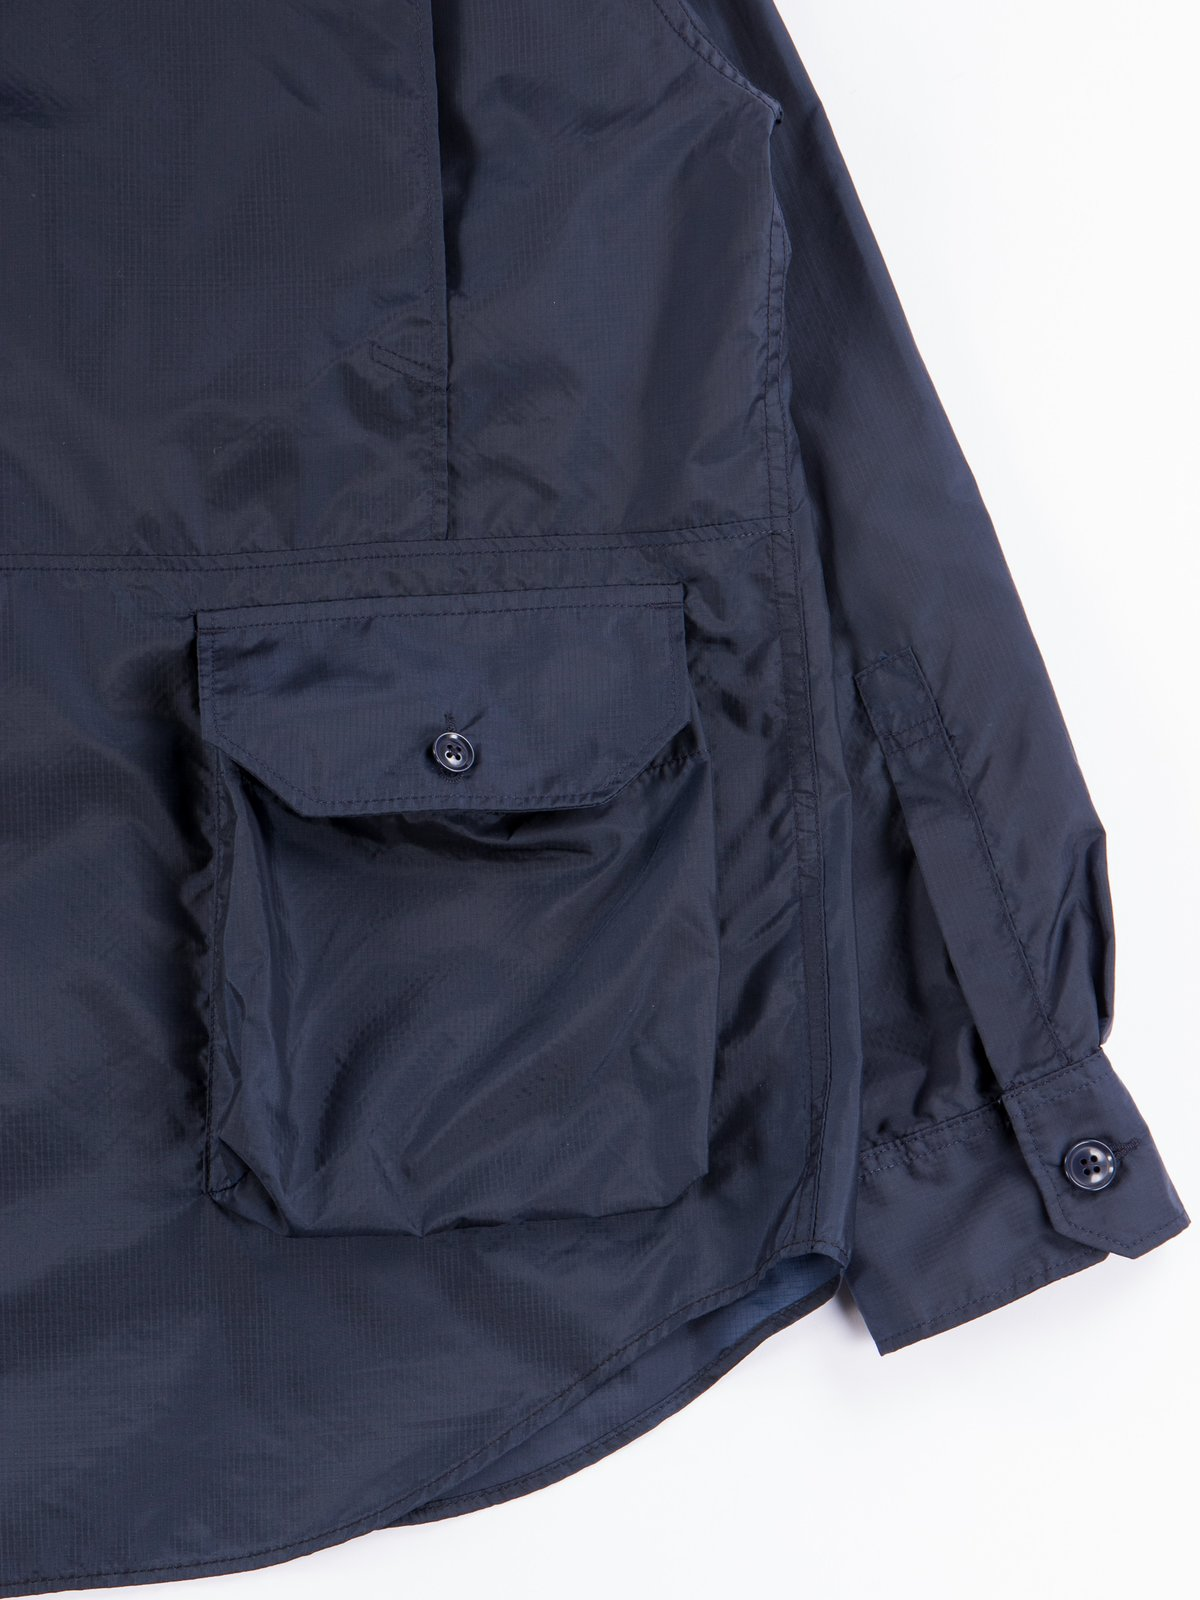 Navy Nylon Micro Ripstop Explorer Shirt Jacket  - Image 8